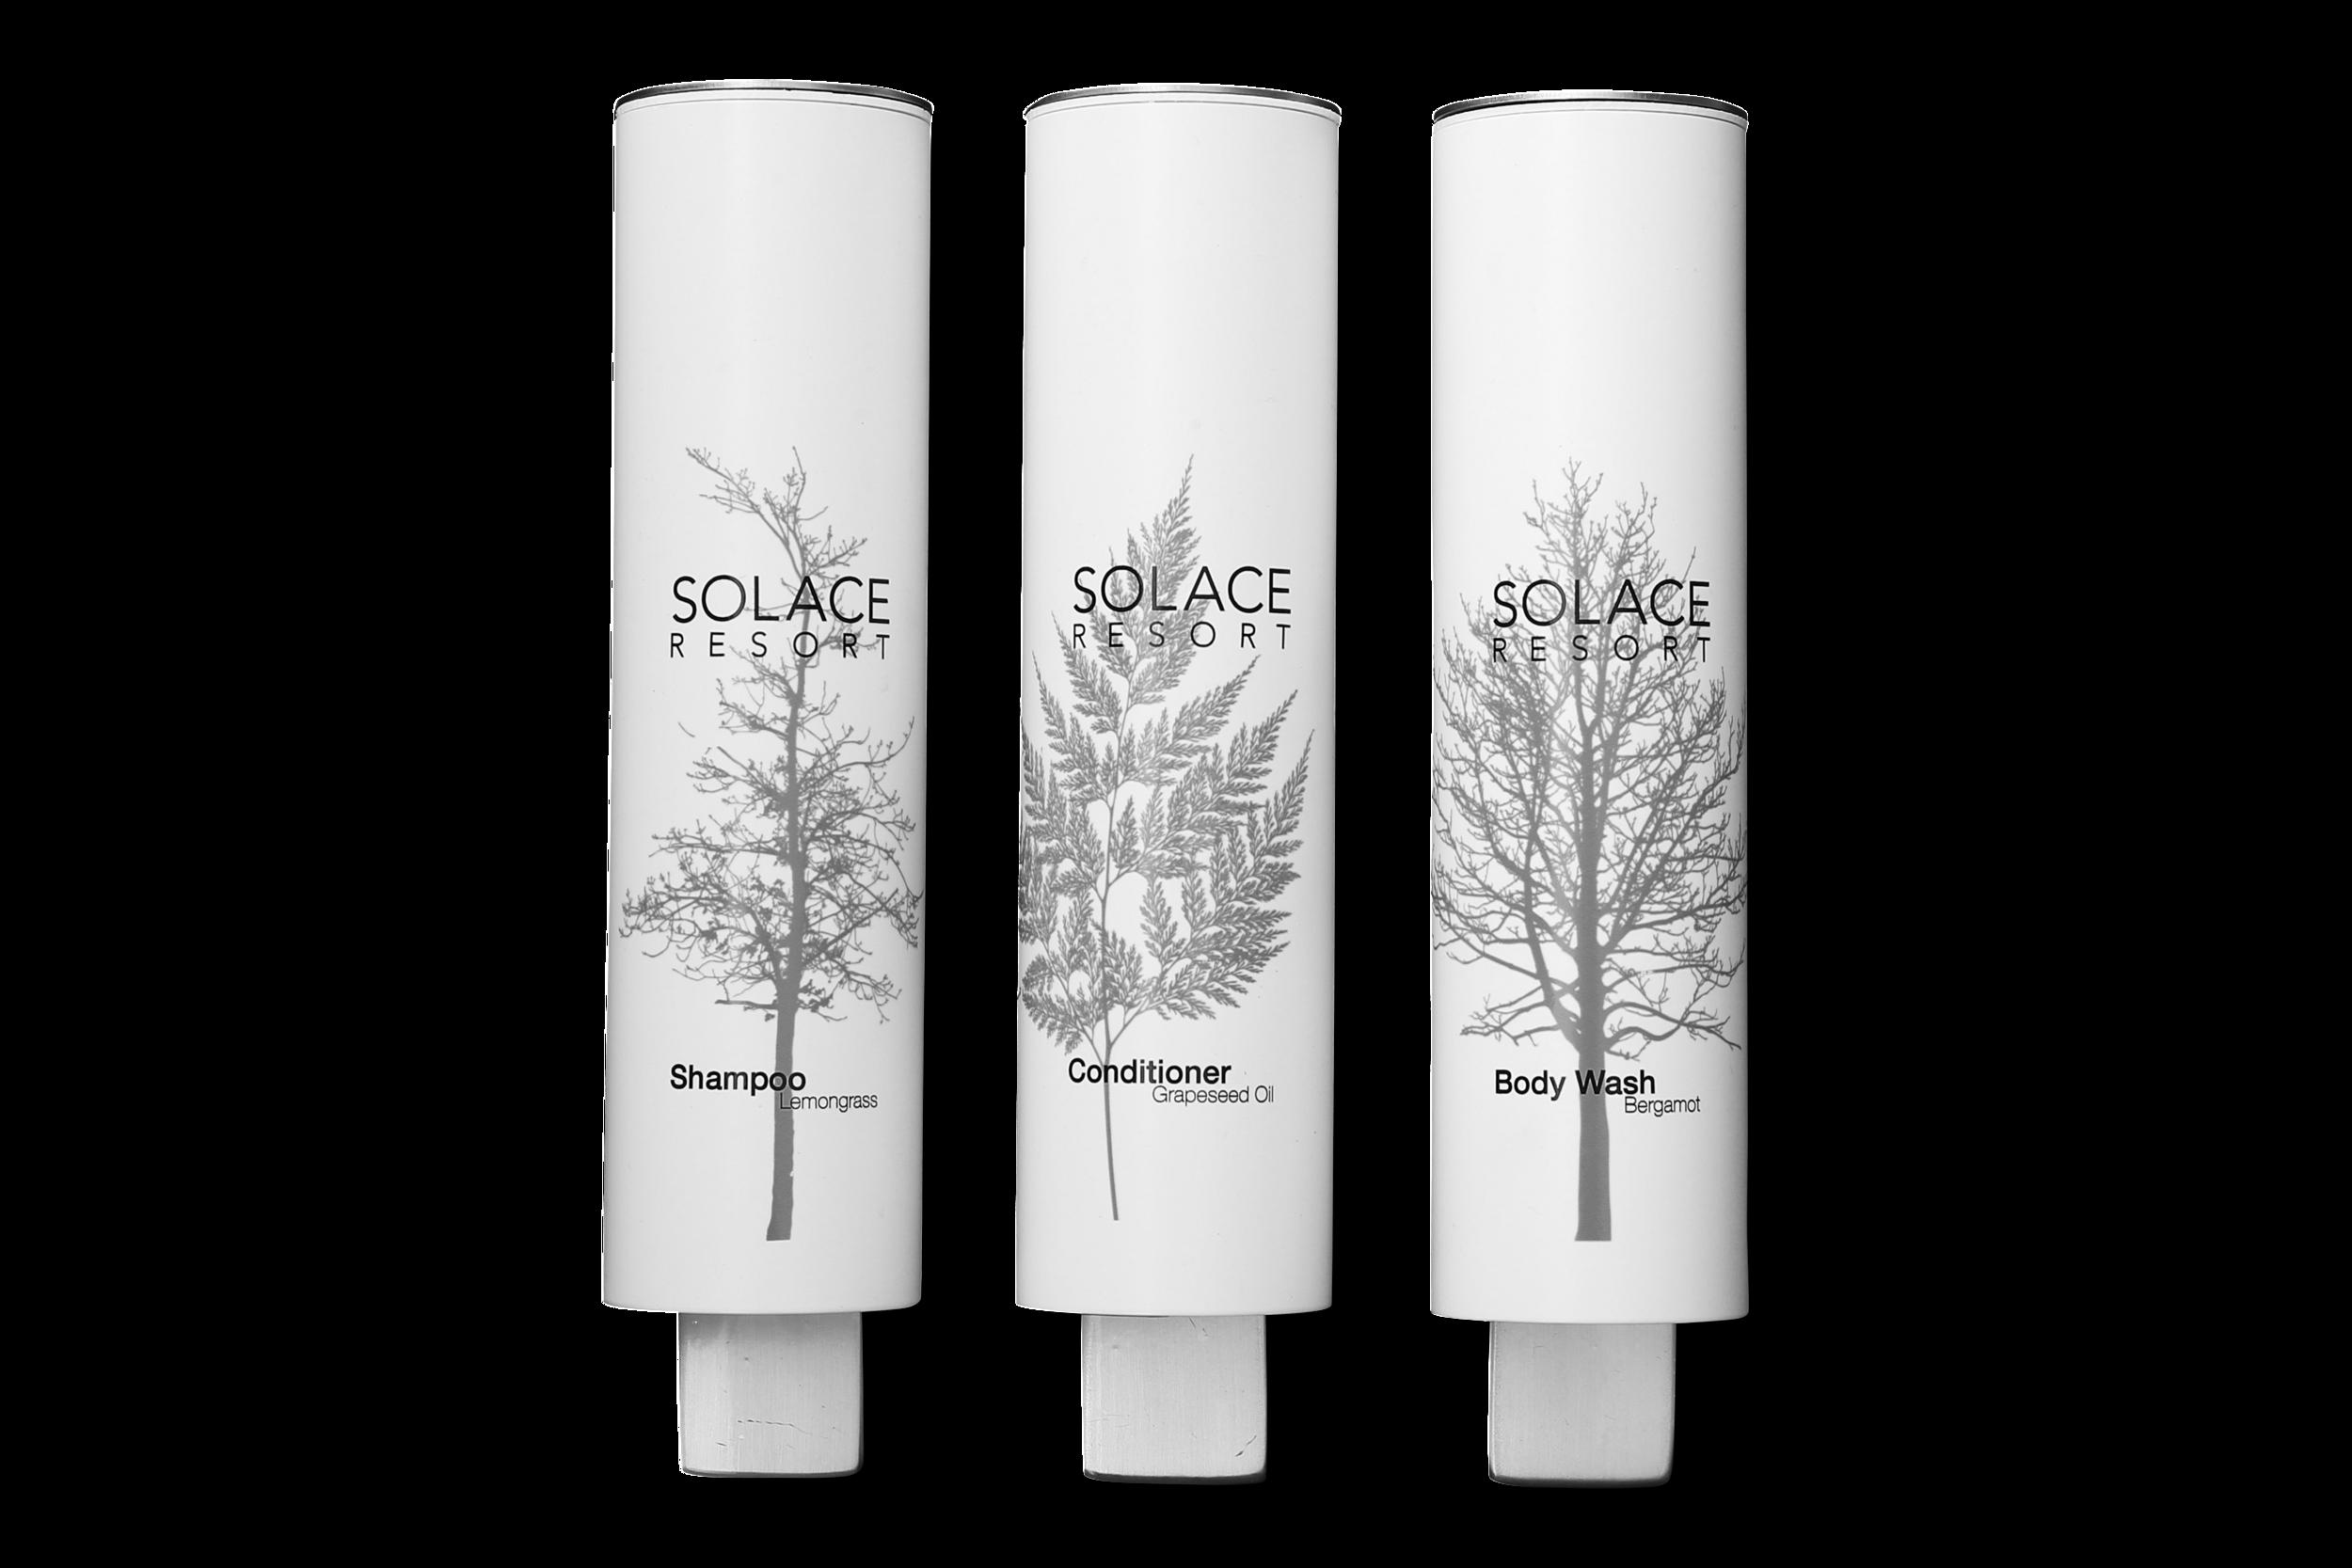 Kure hotel shampoo dispenser details.png